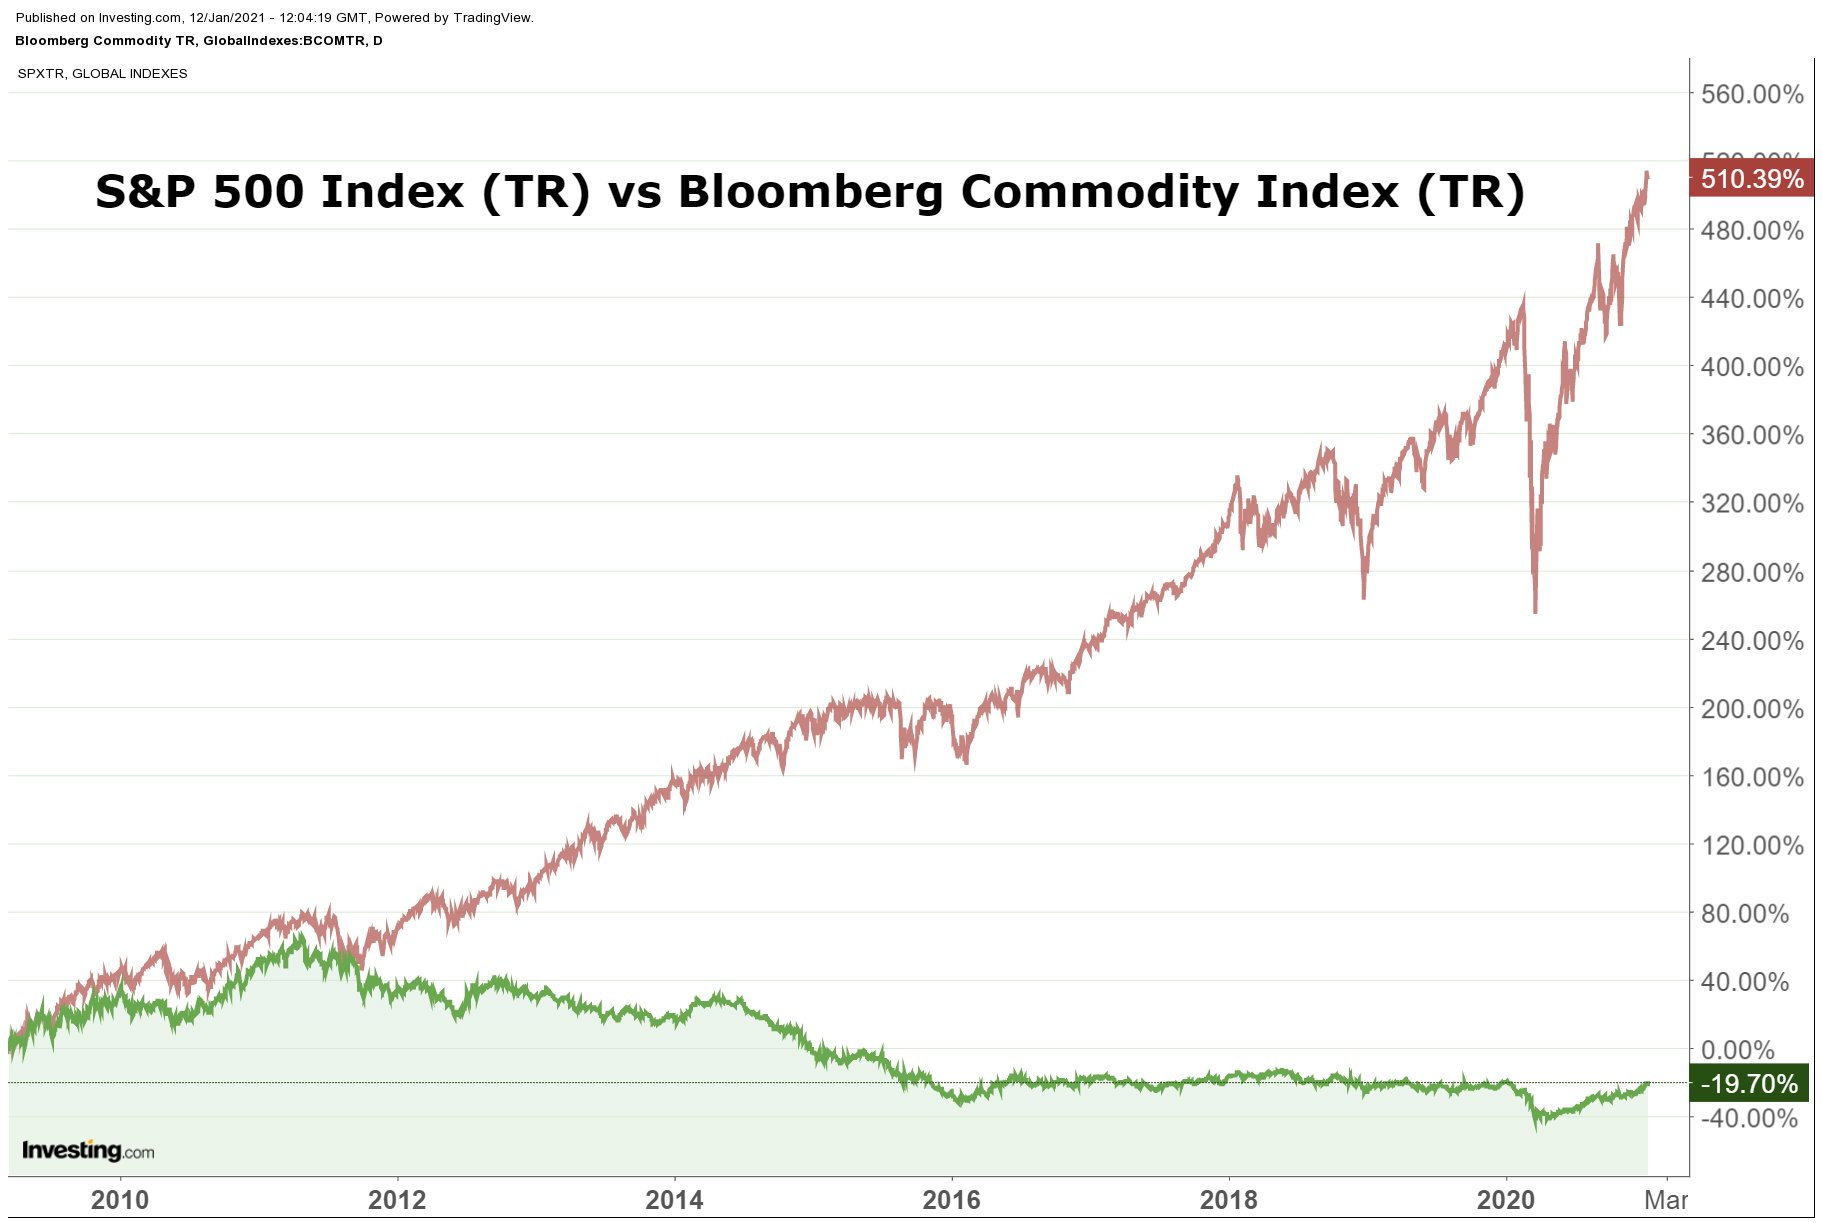 S&P 500 vs. Bloomberg Commodity Index